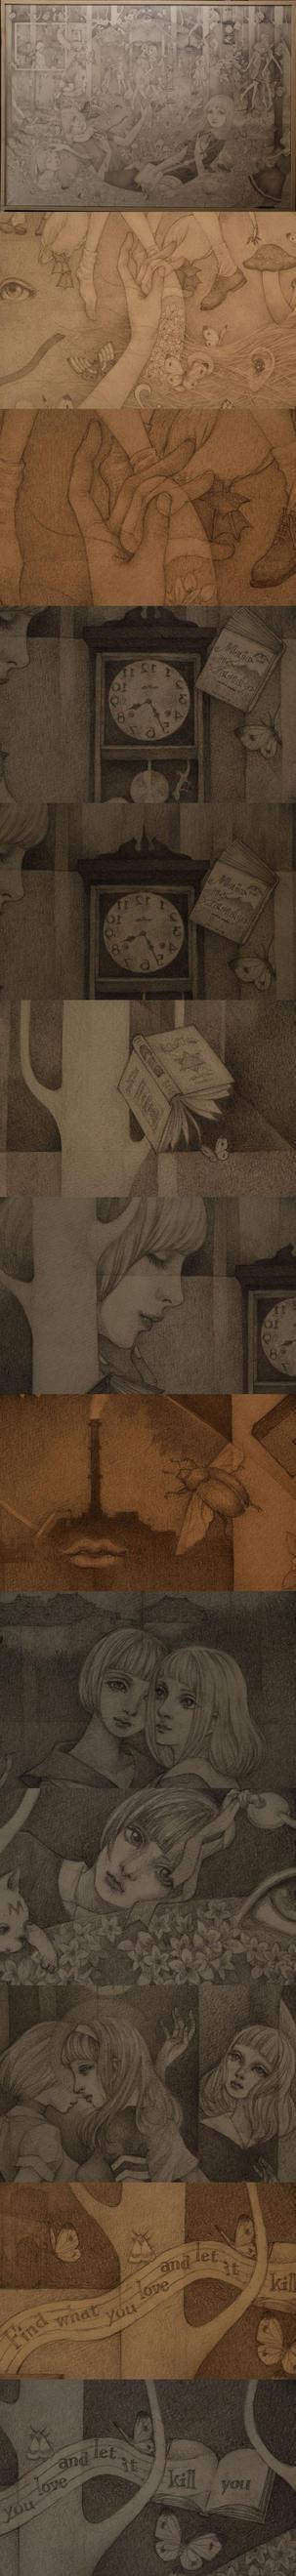 A detail4 by musubunakai